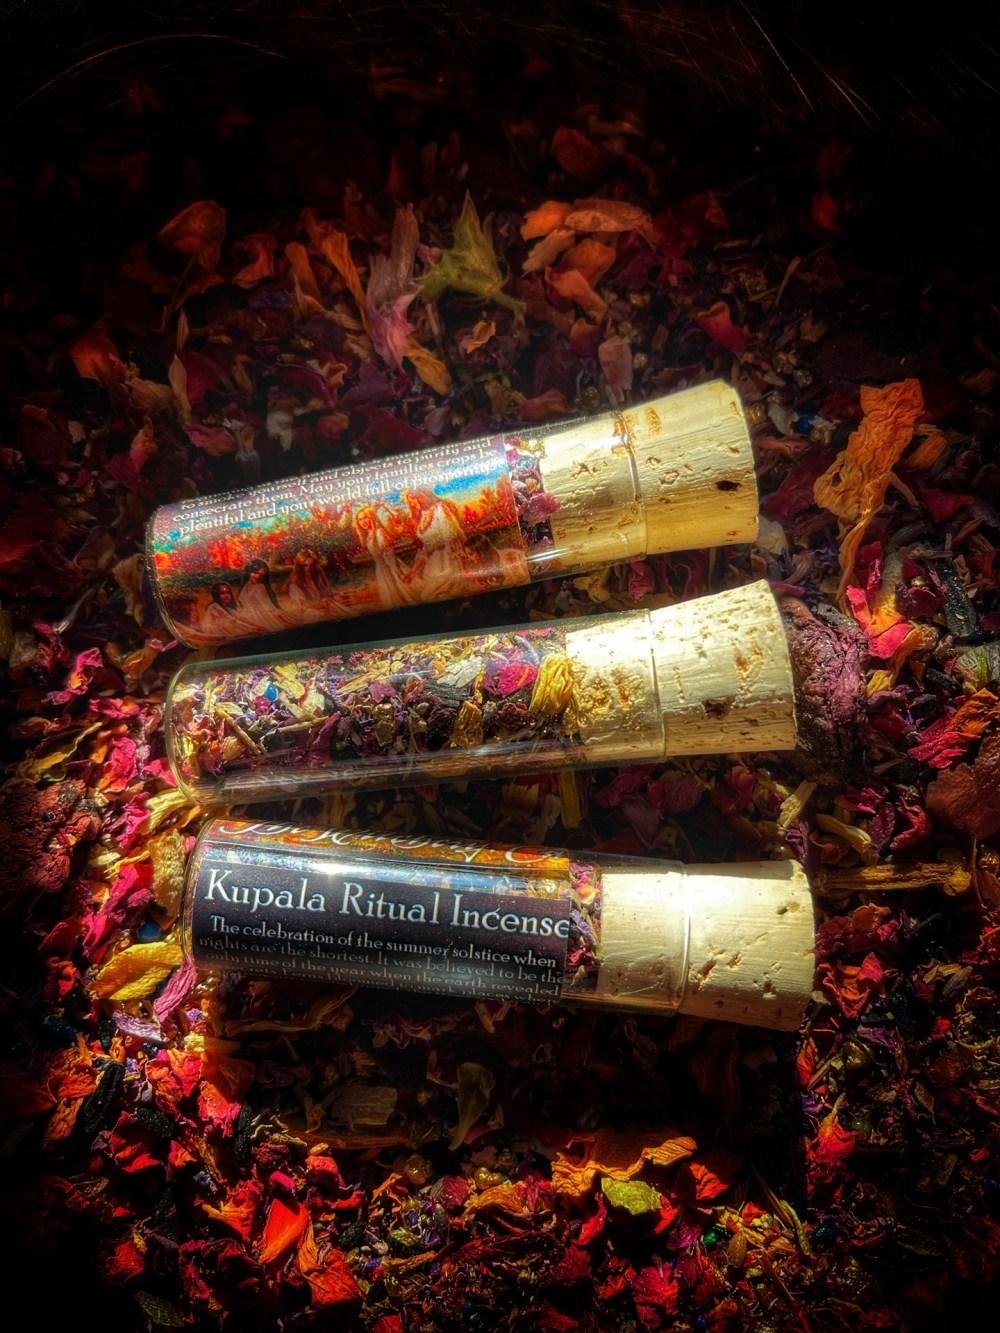 Kupala Summer Solstice Ritual Incense